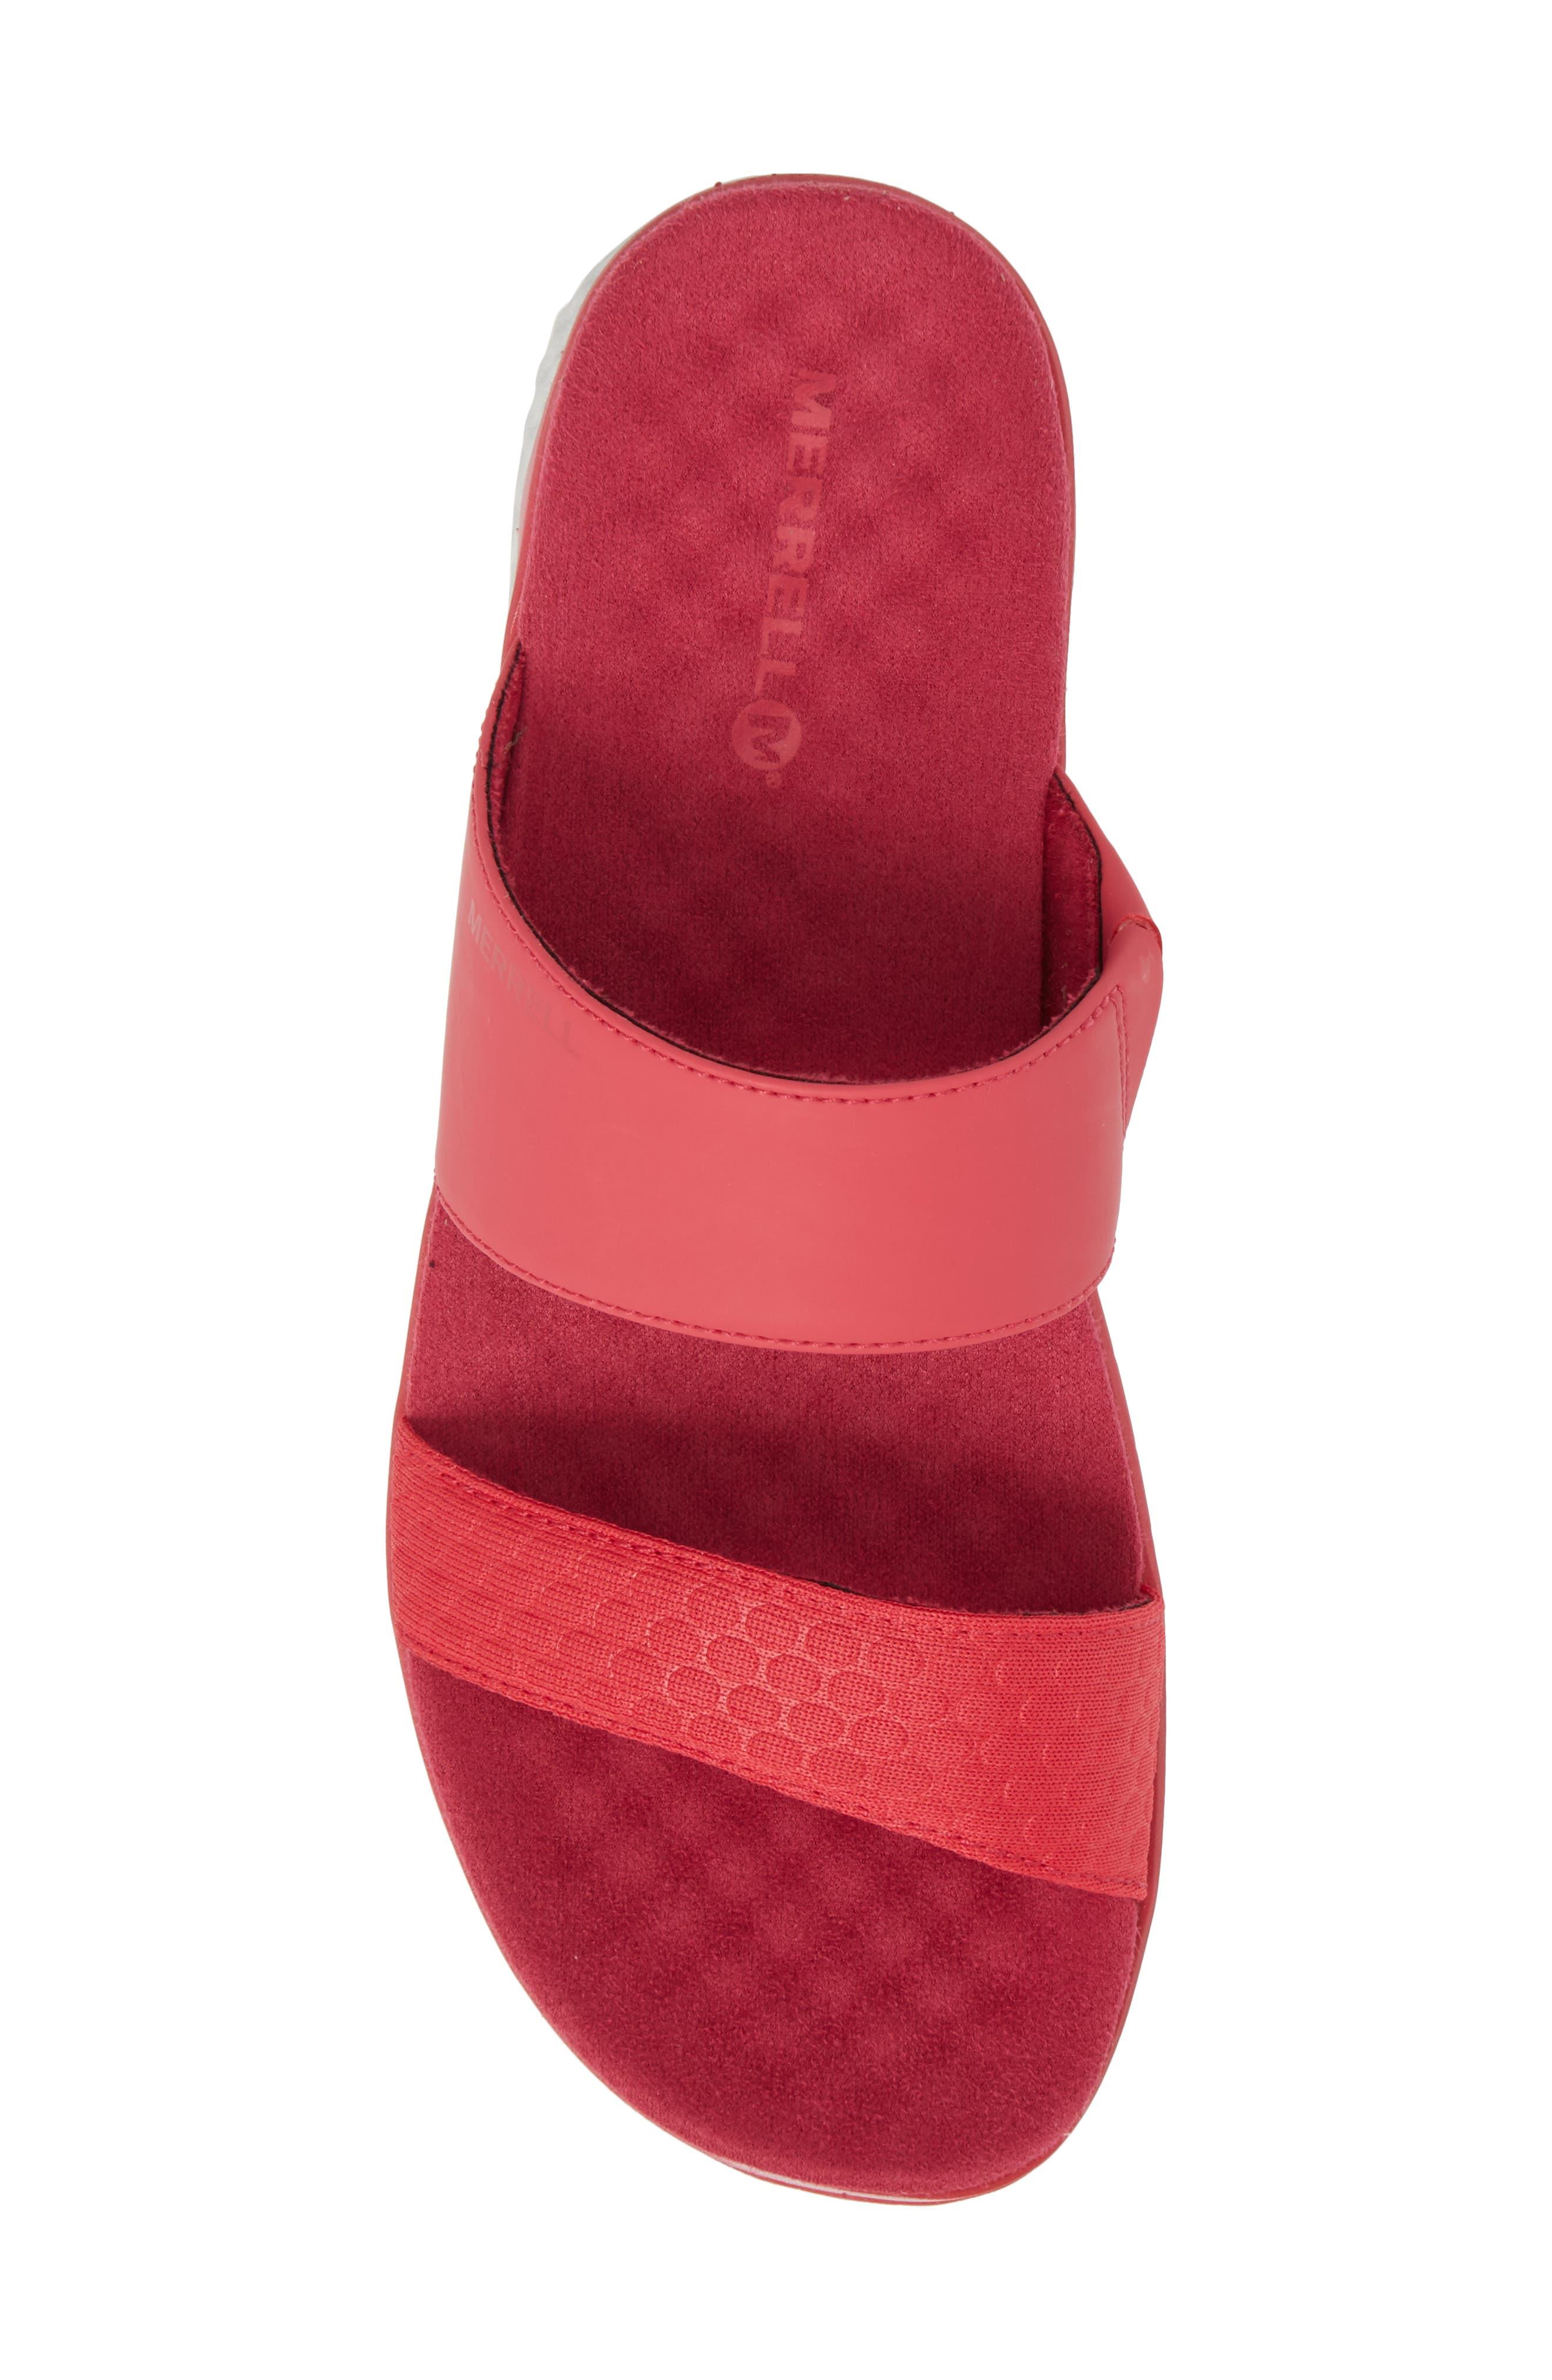 1SIX8 Linna Air Cushion+ Slide Sandal,                             Alternate thumbnail 20, color,